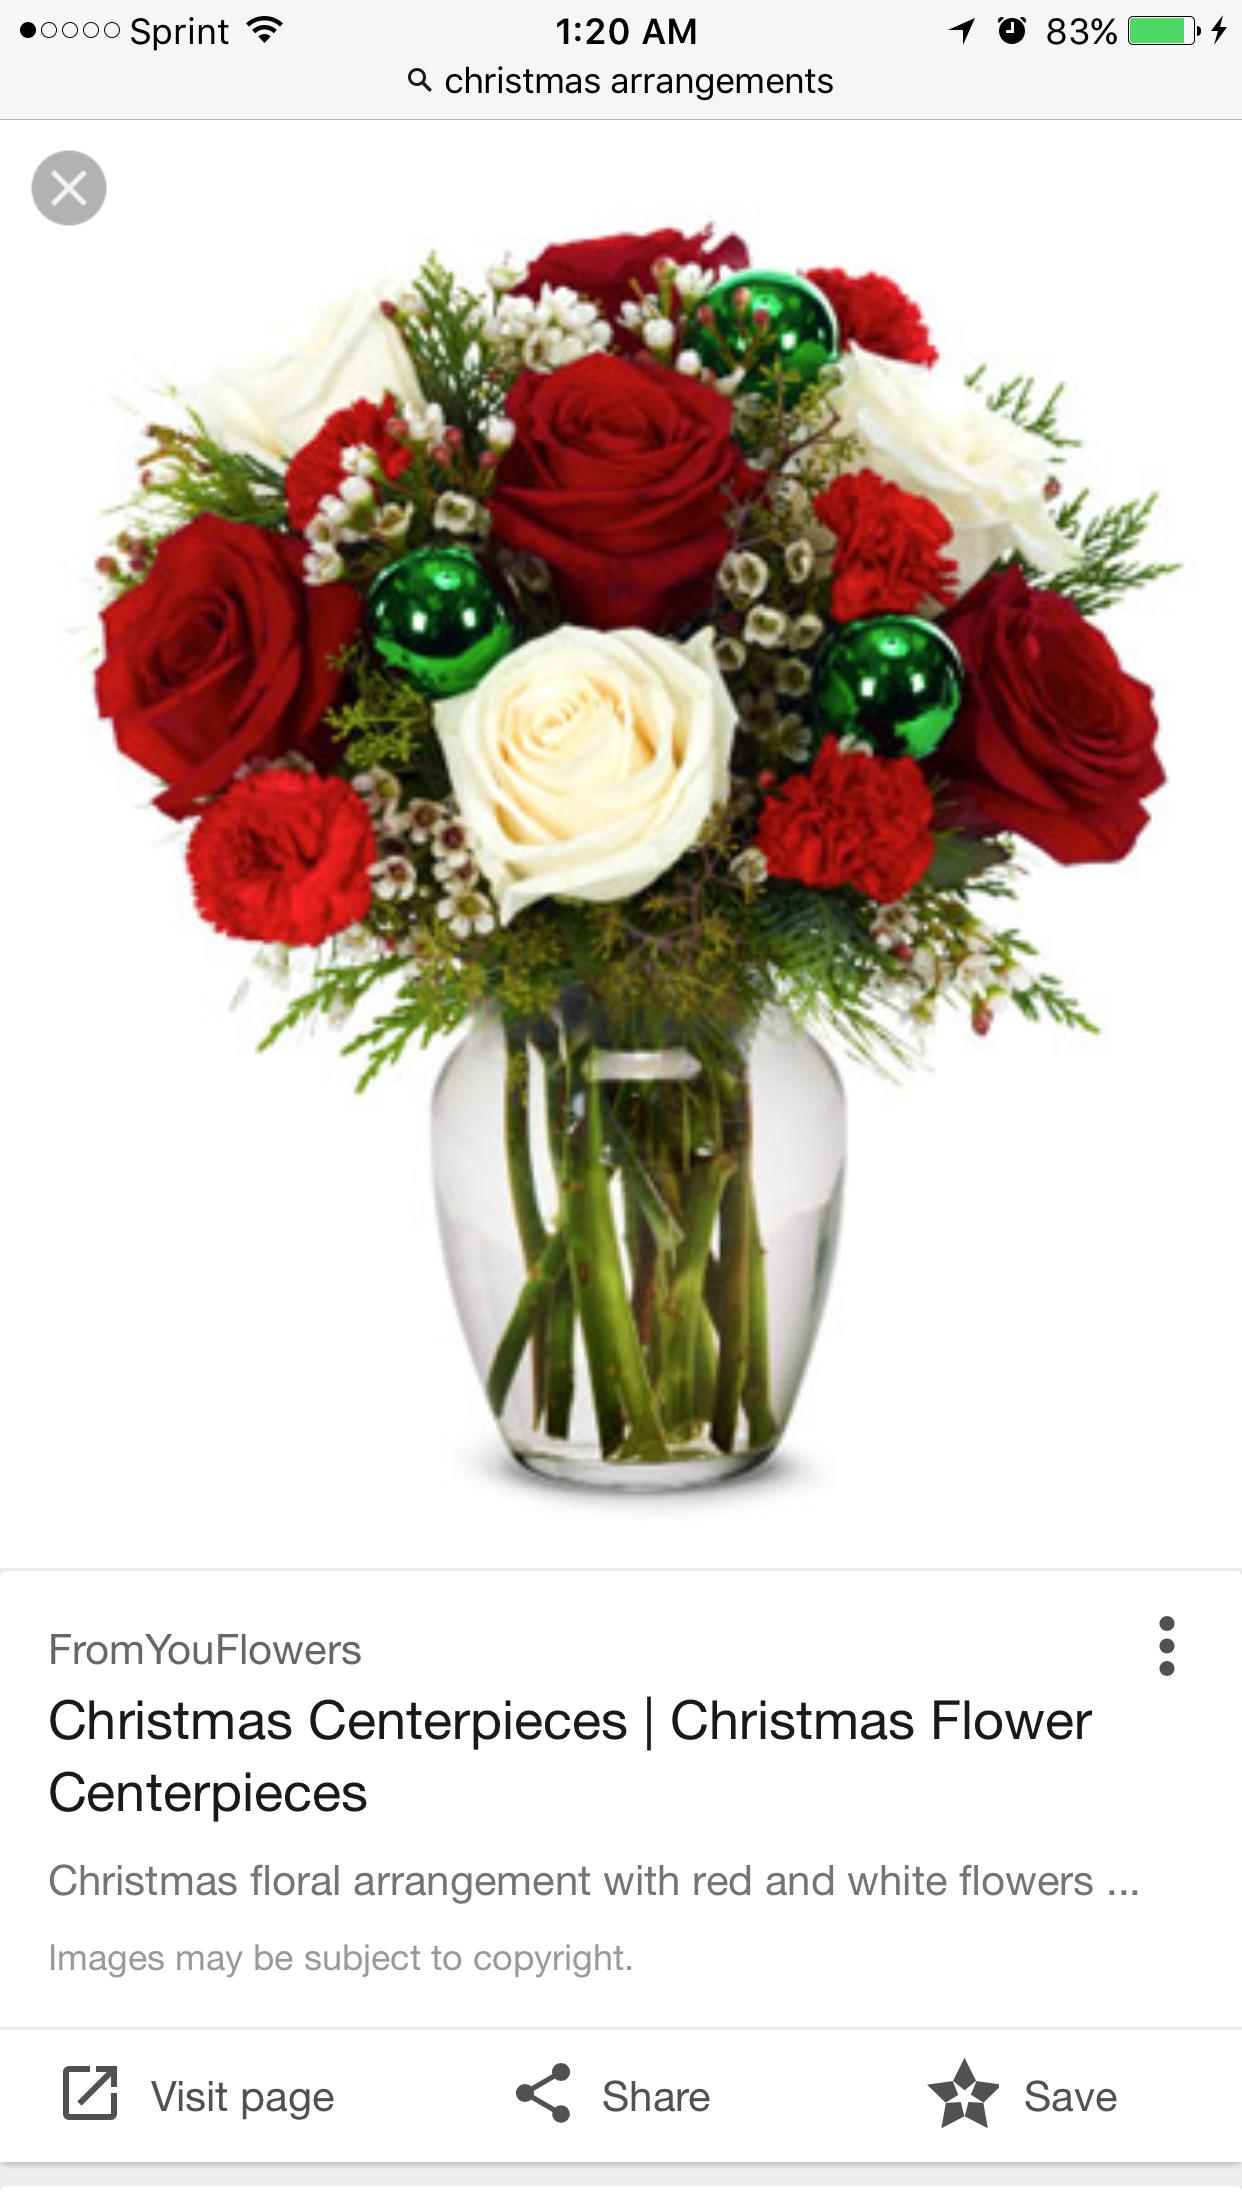 Christmas roses carnations and leather leaf holiday fleur de lys eshopclub same day flower delivery fresh flowers birthday flowers send flowers flower arrangements floral arrangements flowers izmirmasajfo